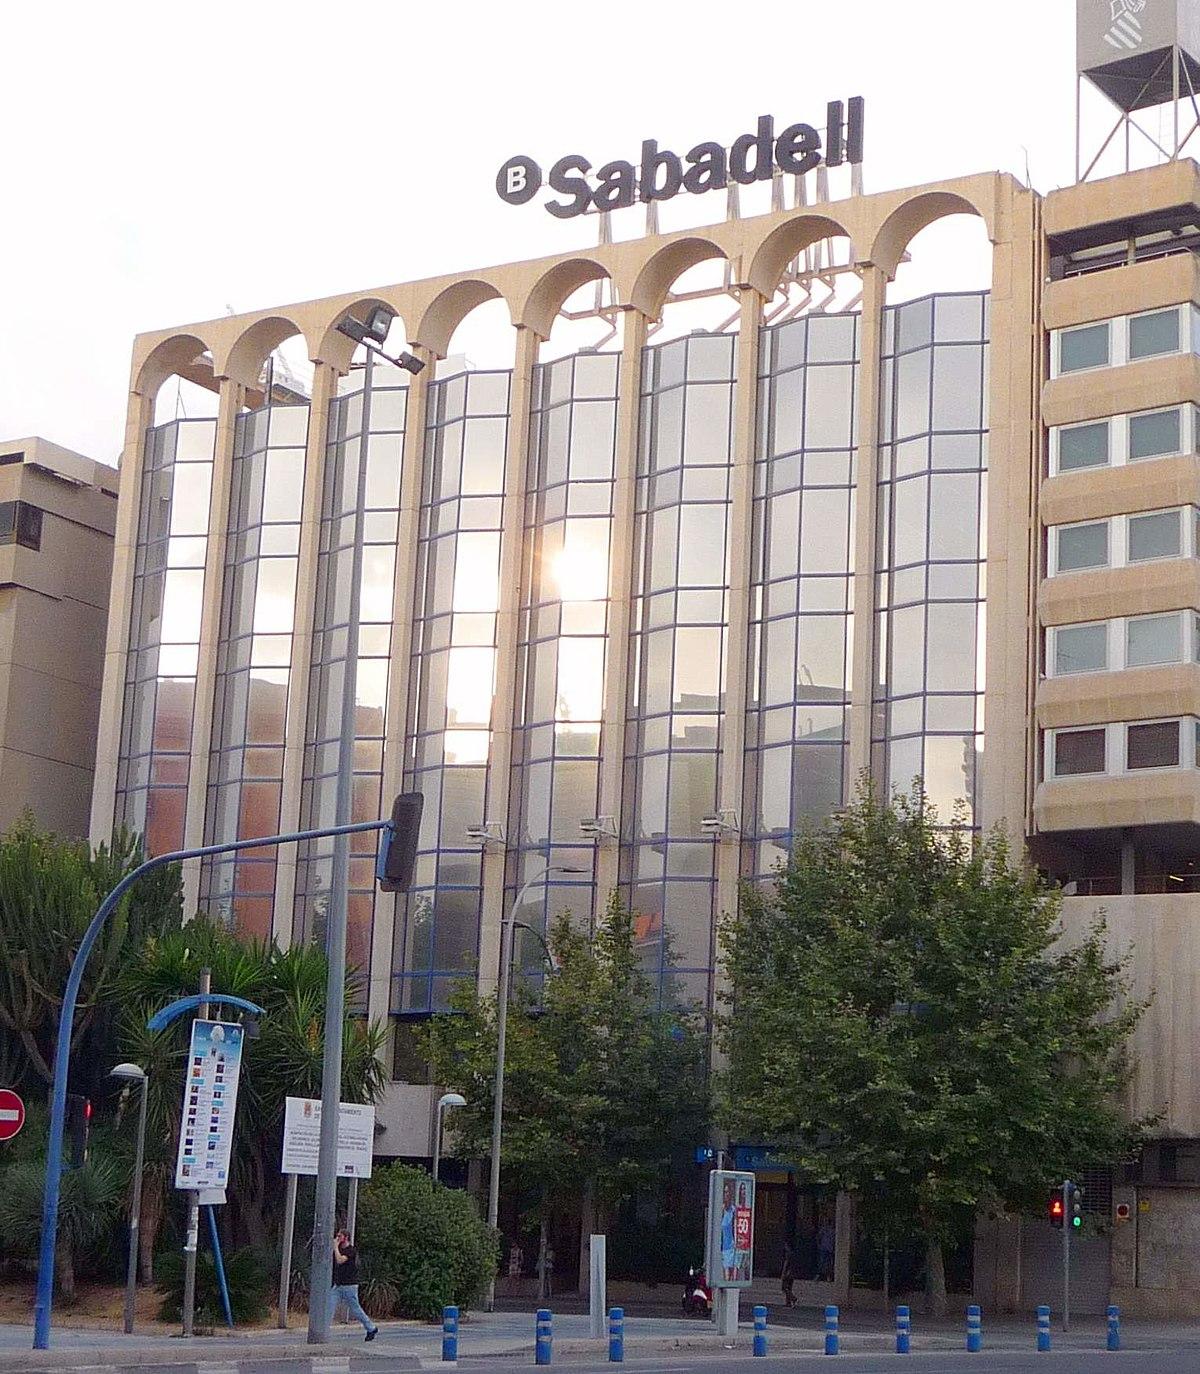 Banco sabadell wikipedia la enciclopedia libre for Oficinas bancsabadell